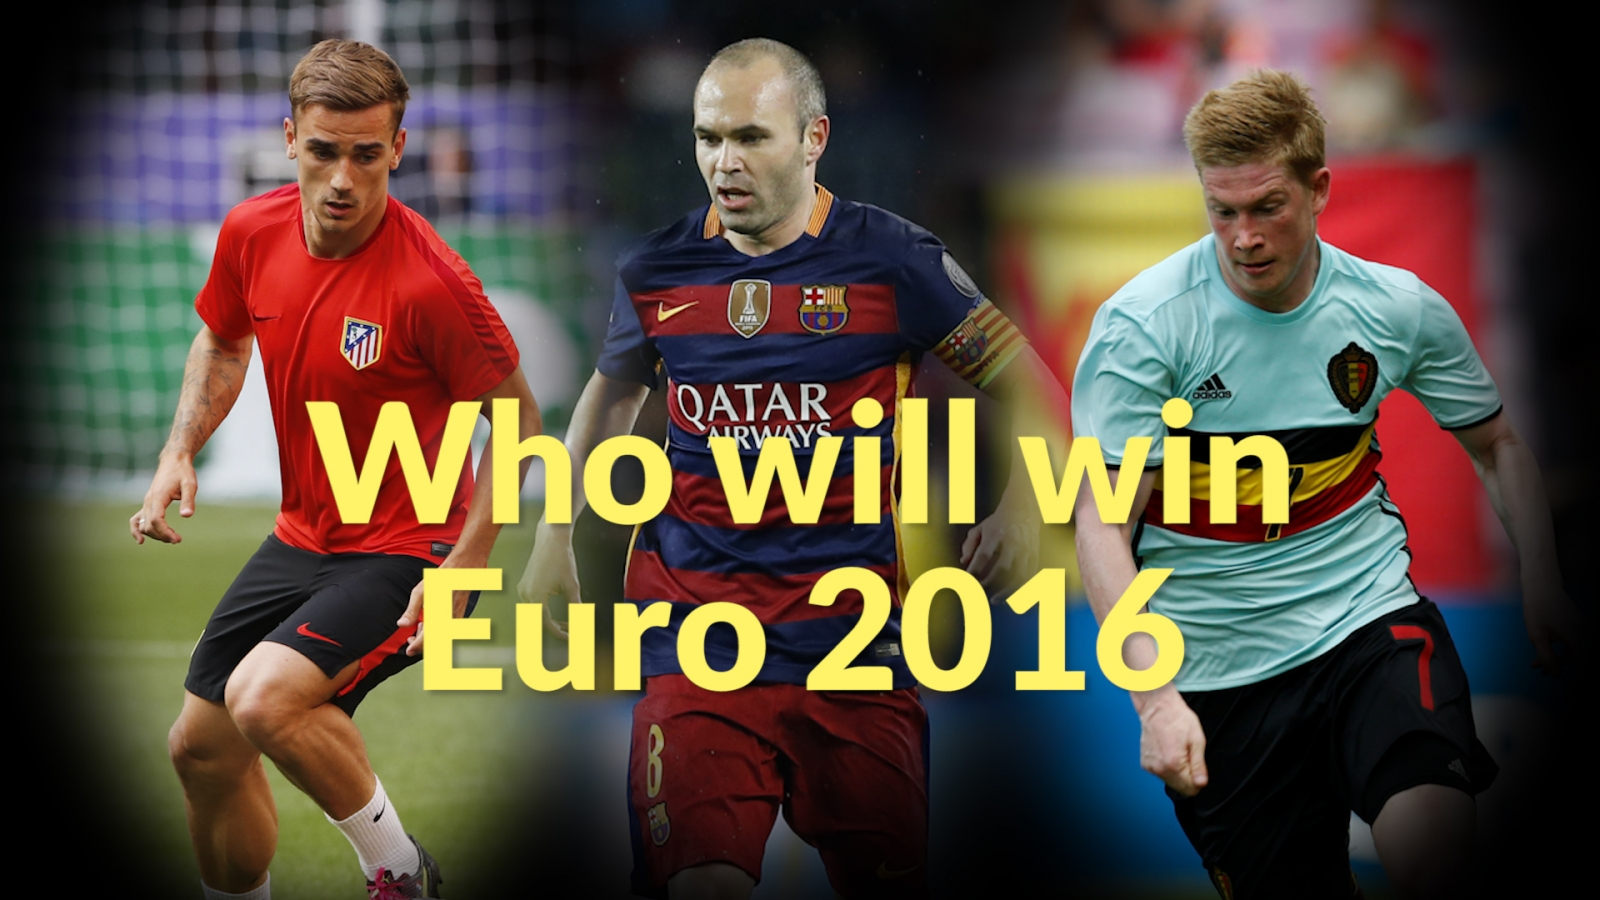 Euro 2016: Who will win Euro 2016?